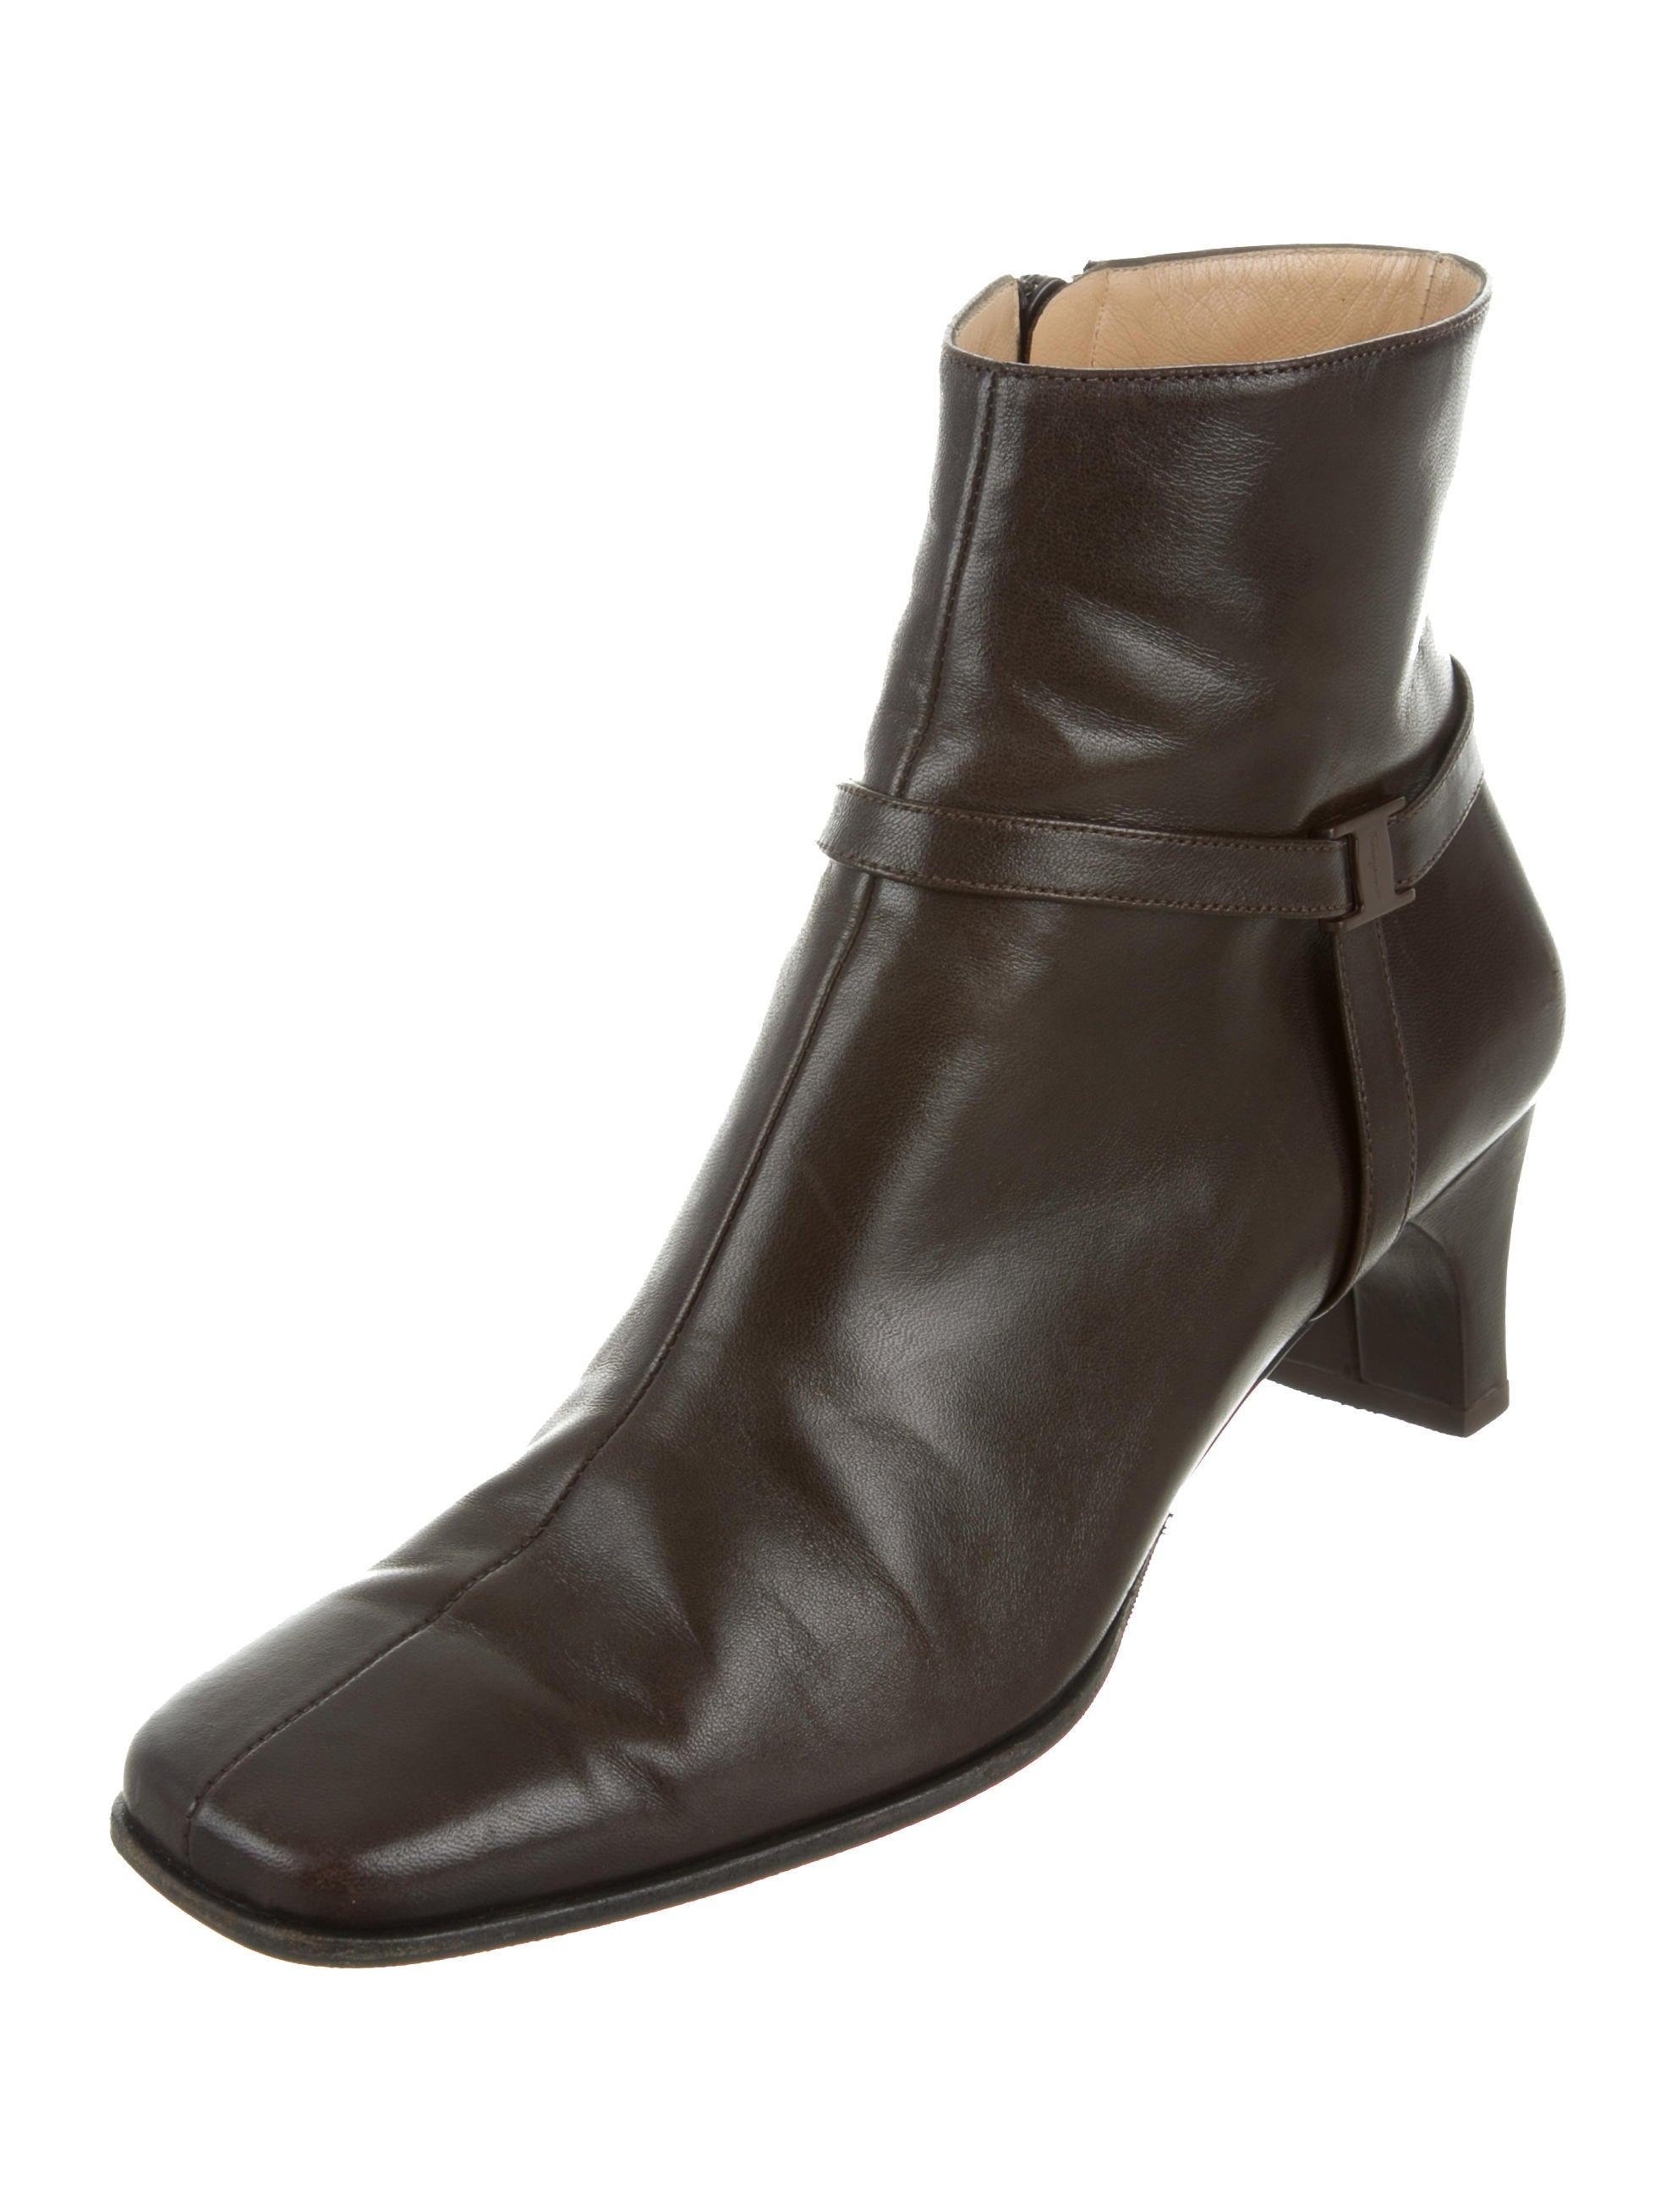 outlet for sale Salvatore Ferragamo Leather Square-Toe Boots exclusive online cheap purchase zZezLs4VsH